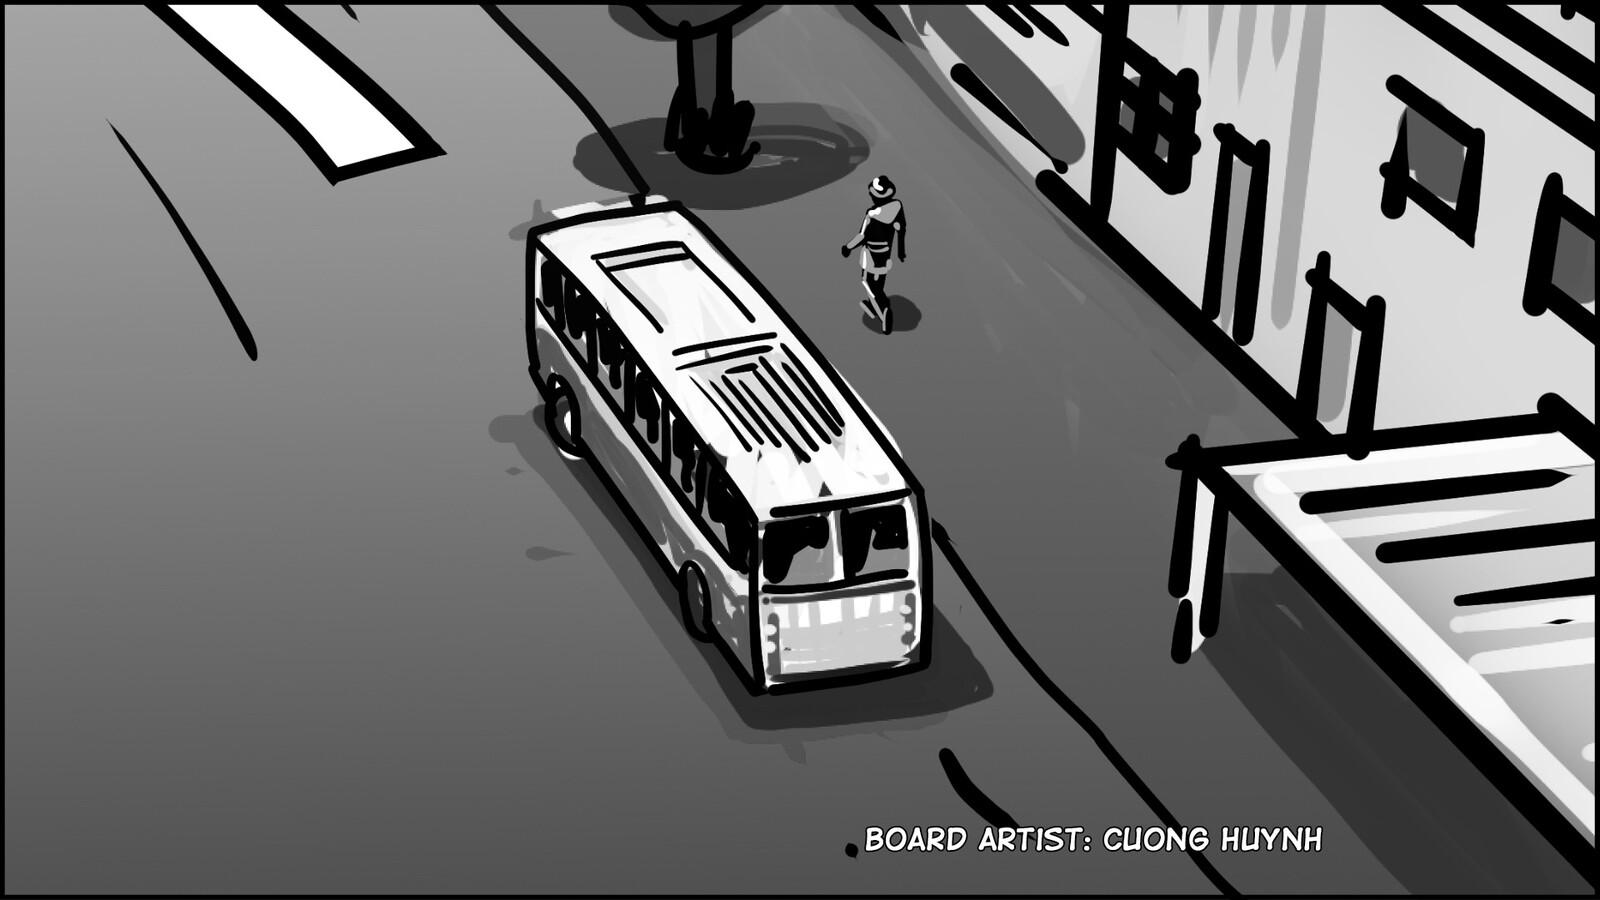 PANEL 21A: Cuong Huynh